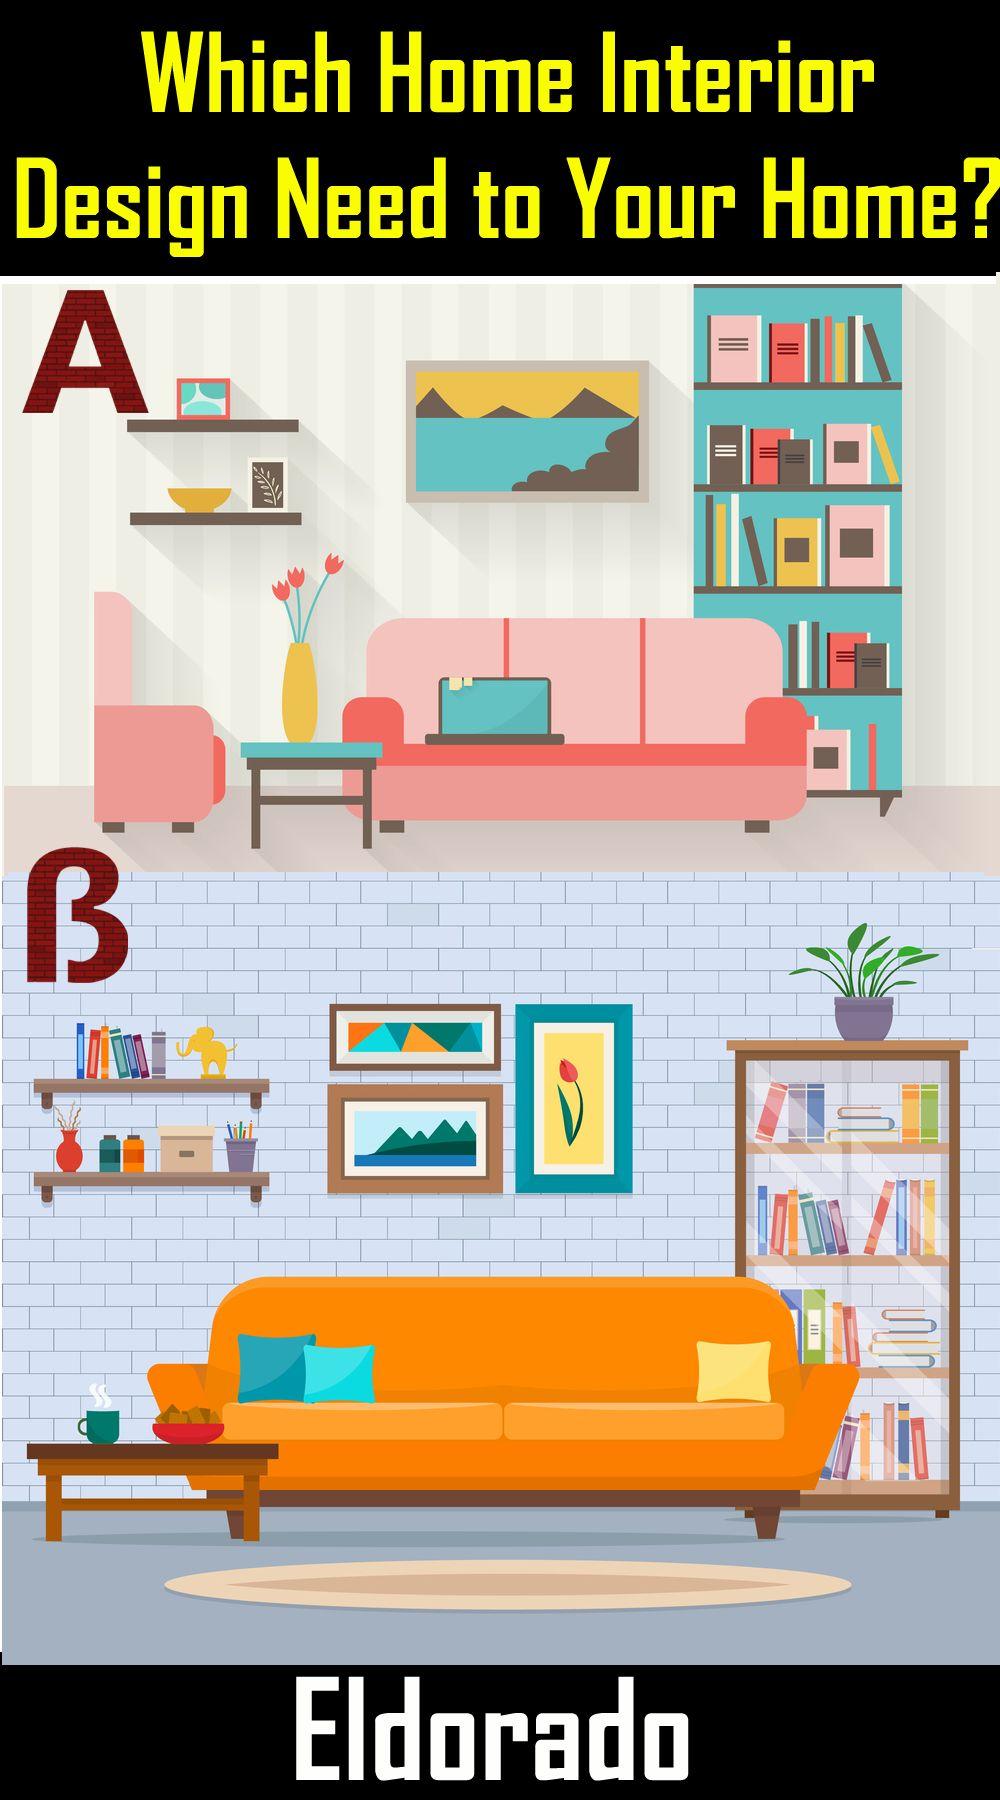 High Quality Pin By Eldorado Interiors Pvt Ltd On Home Interior Design | Pinterest |  Interiors